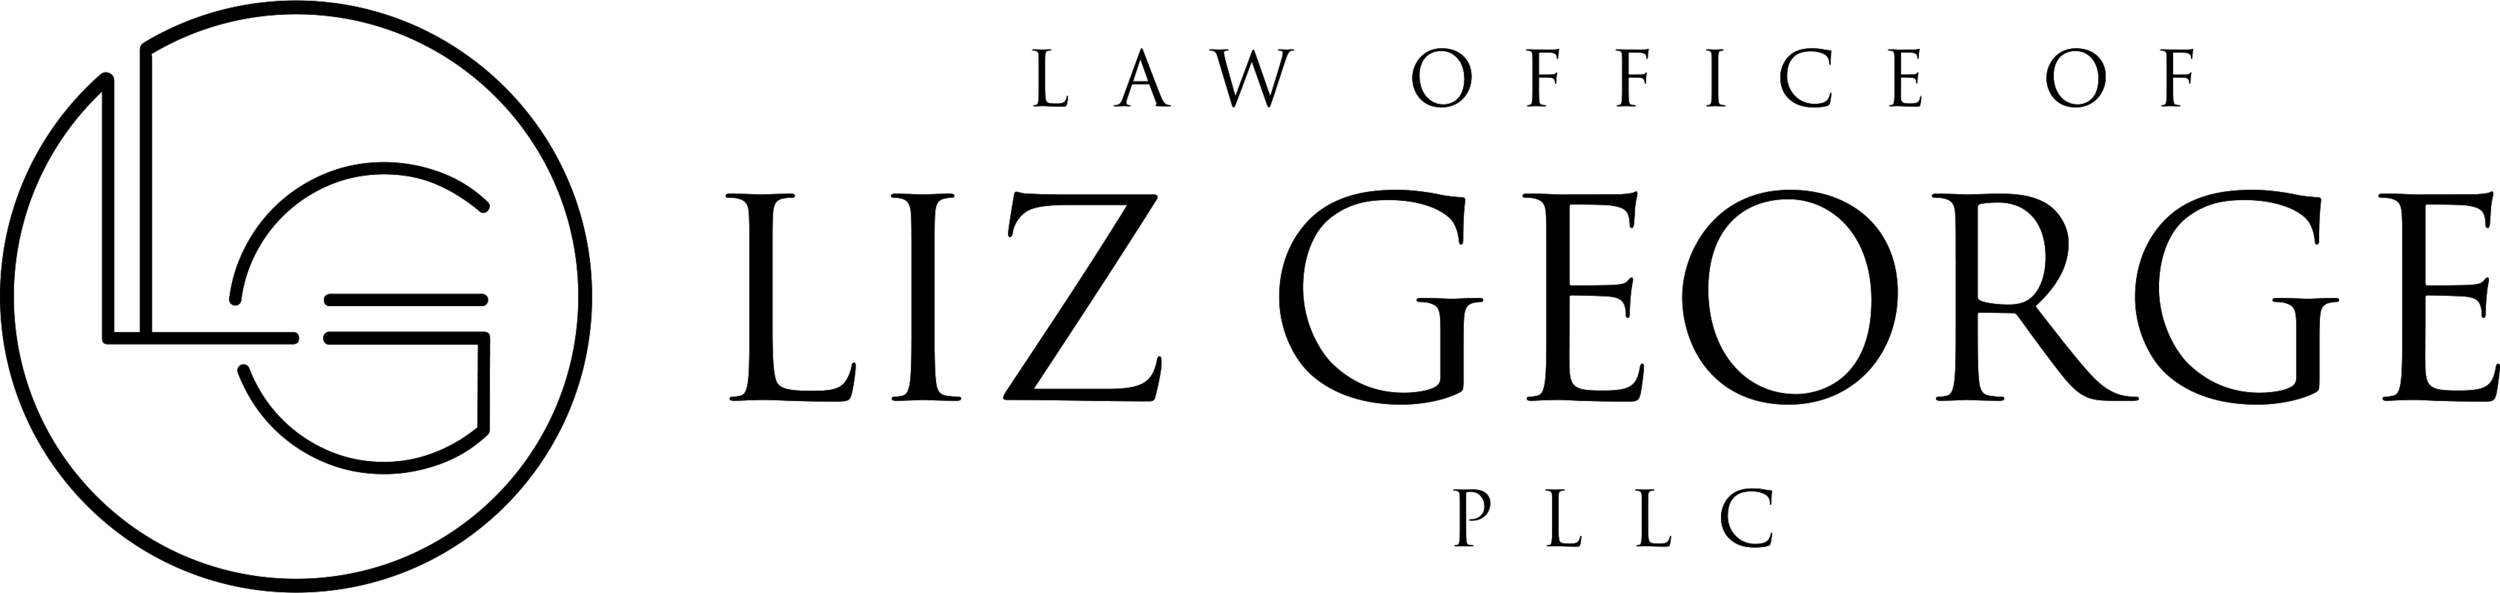 LG Logo Black.png